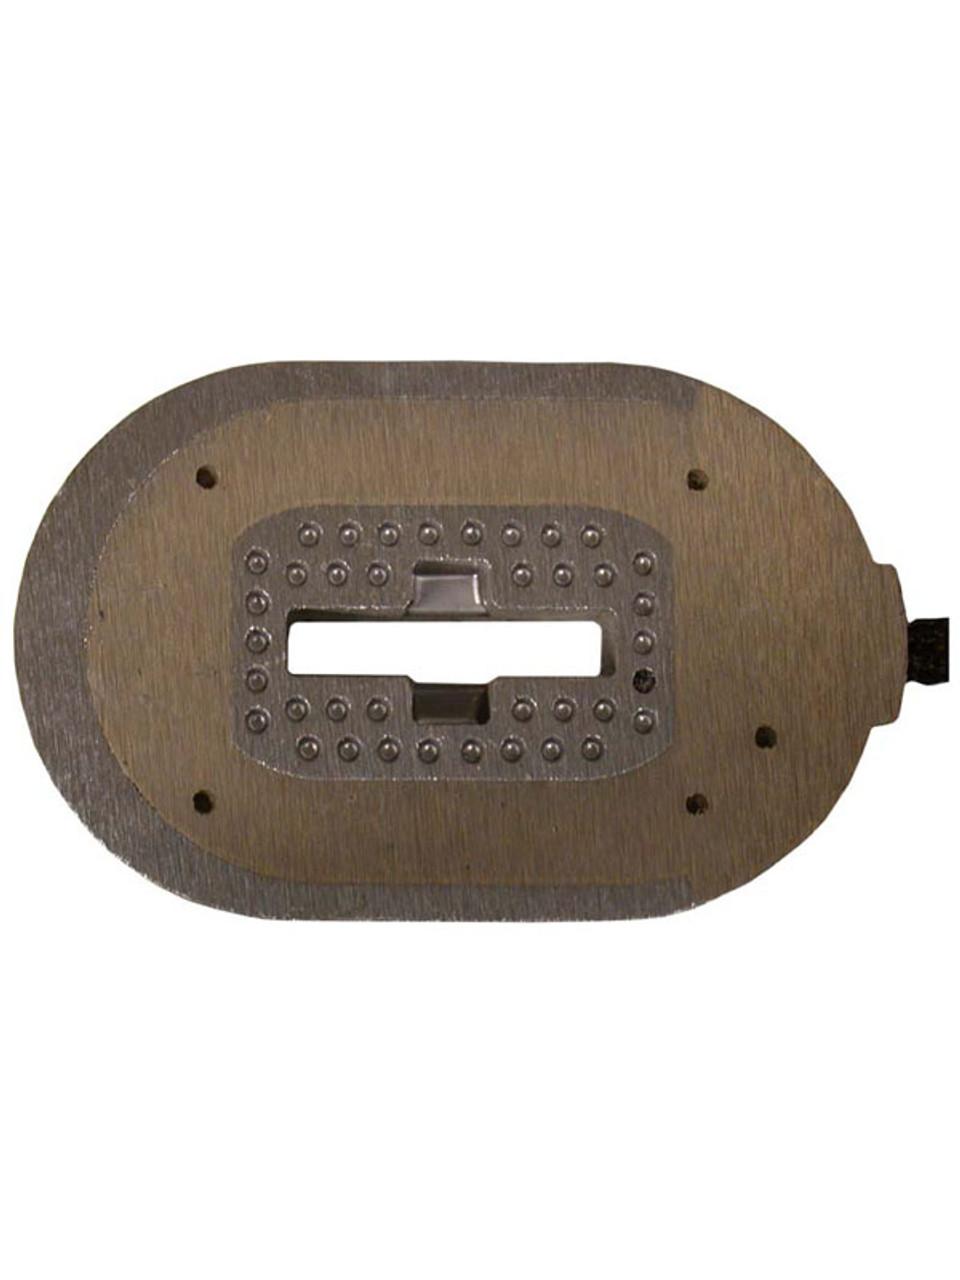 71-377 --- Magnet Kit for 12,000 lb Capacity Dexter Electric Brakes